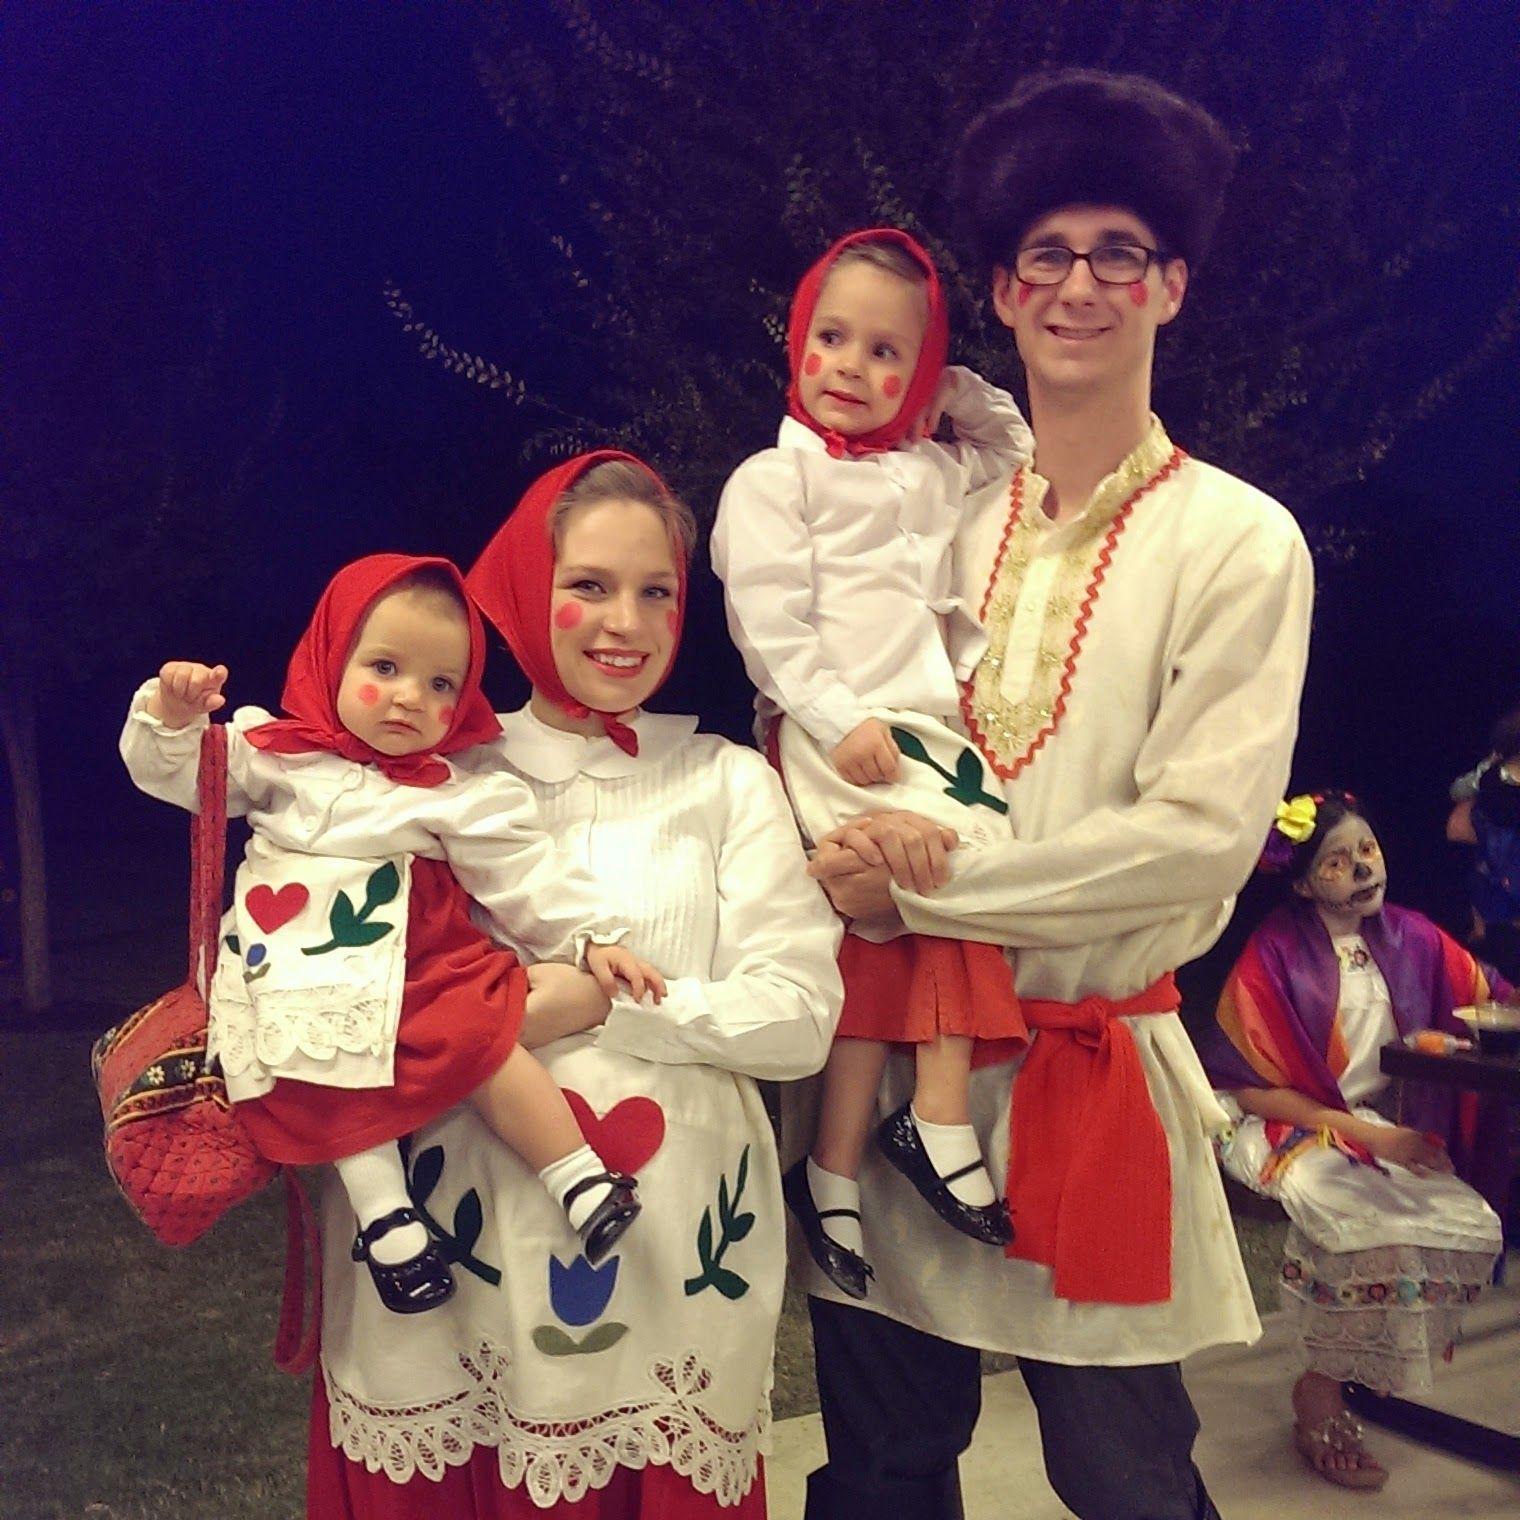 The Podge Files Diy Homemade Russian Nesting Dolls Family Costume